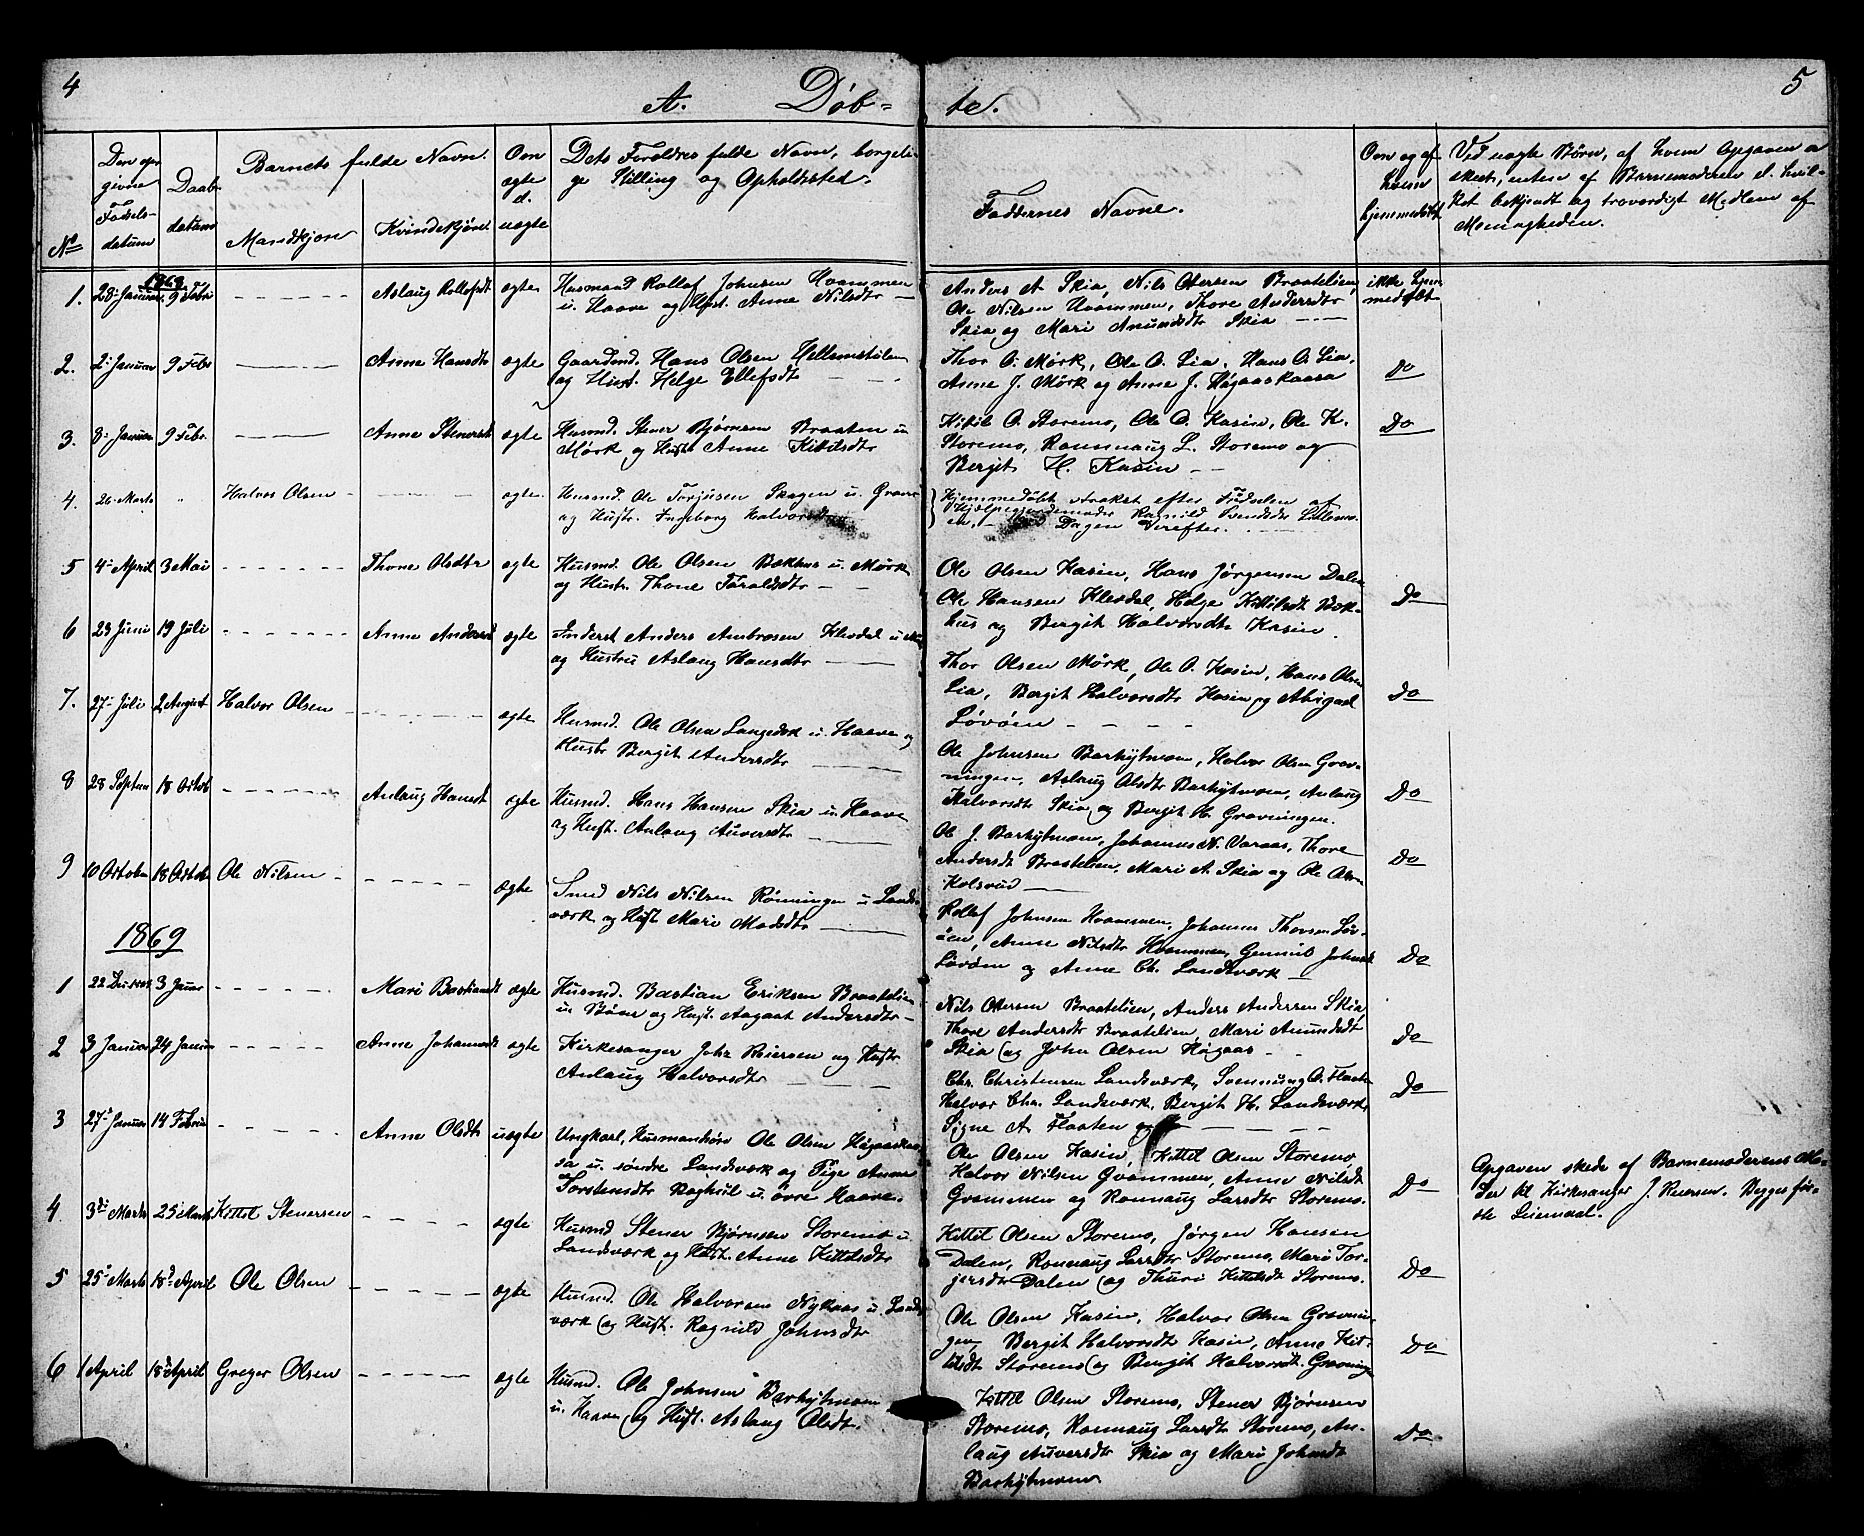 SAKO, Heddal kirkebøker, G/Gb/L0001: Klokkerbok nr. II 1, 1866-1887, s. 4-5